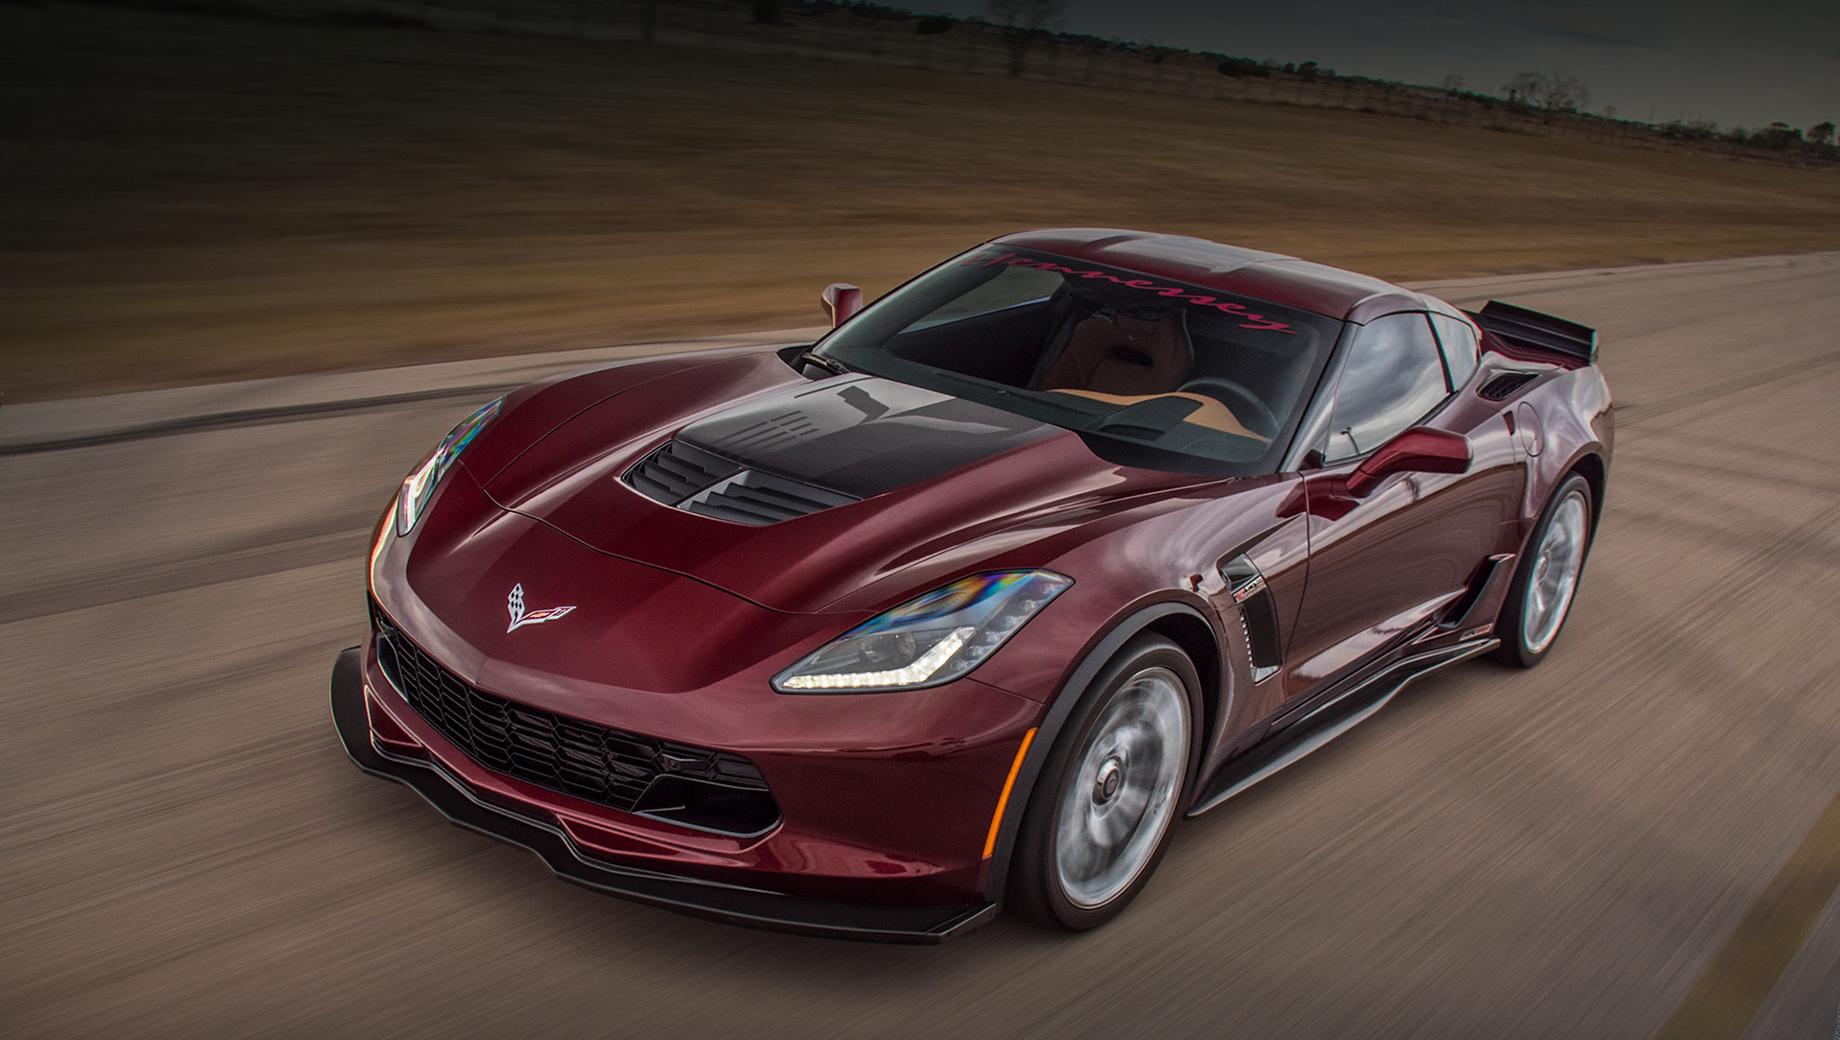 Ателье Hennessey Performance не забыло о модели Corvette Z06